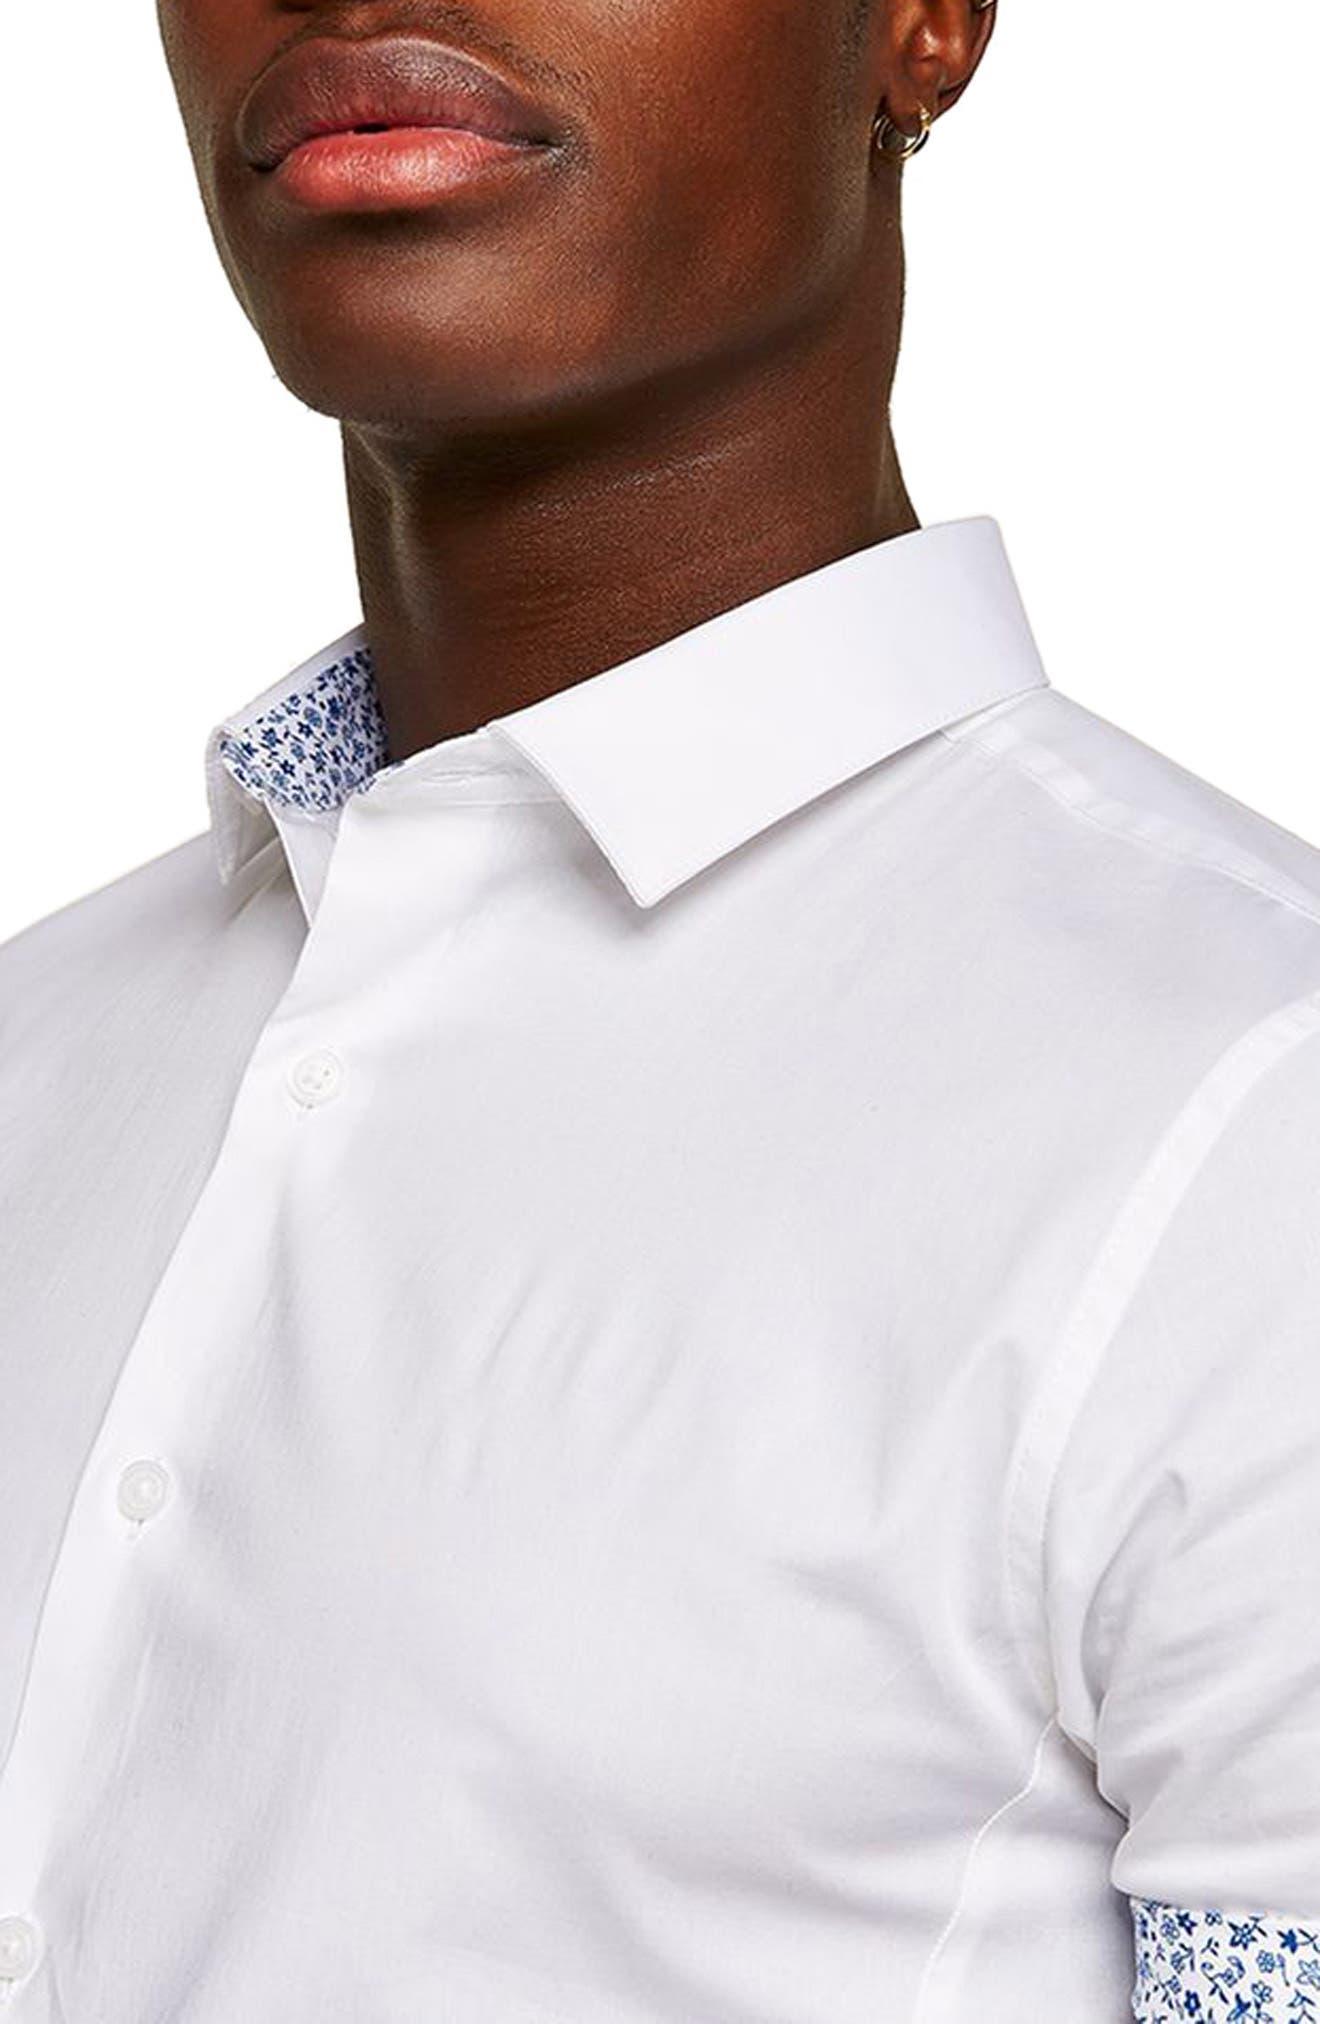 Muscle Fit Floral Trim Shirt,                             Alternate thumbnail 2, color,                             White Multi